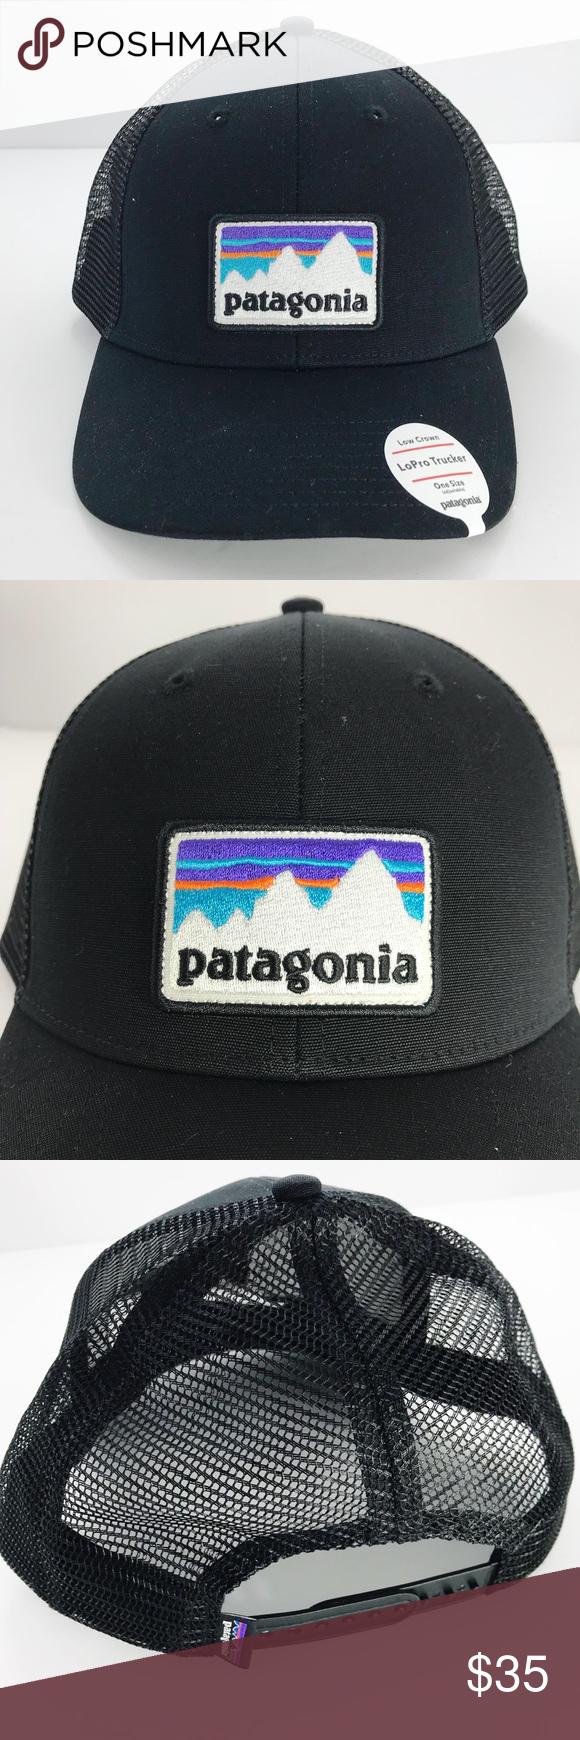 2aecfabd01d Patagonia LoPro Trucker Hat Patagonia Shop Sticker Patch LoPro Trucker Hat  in Black. Low crown